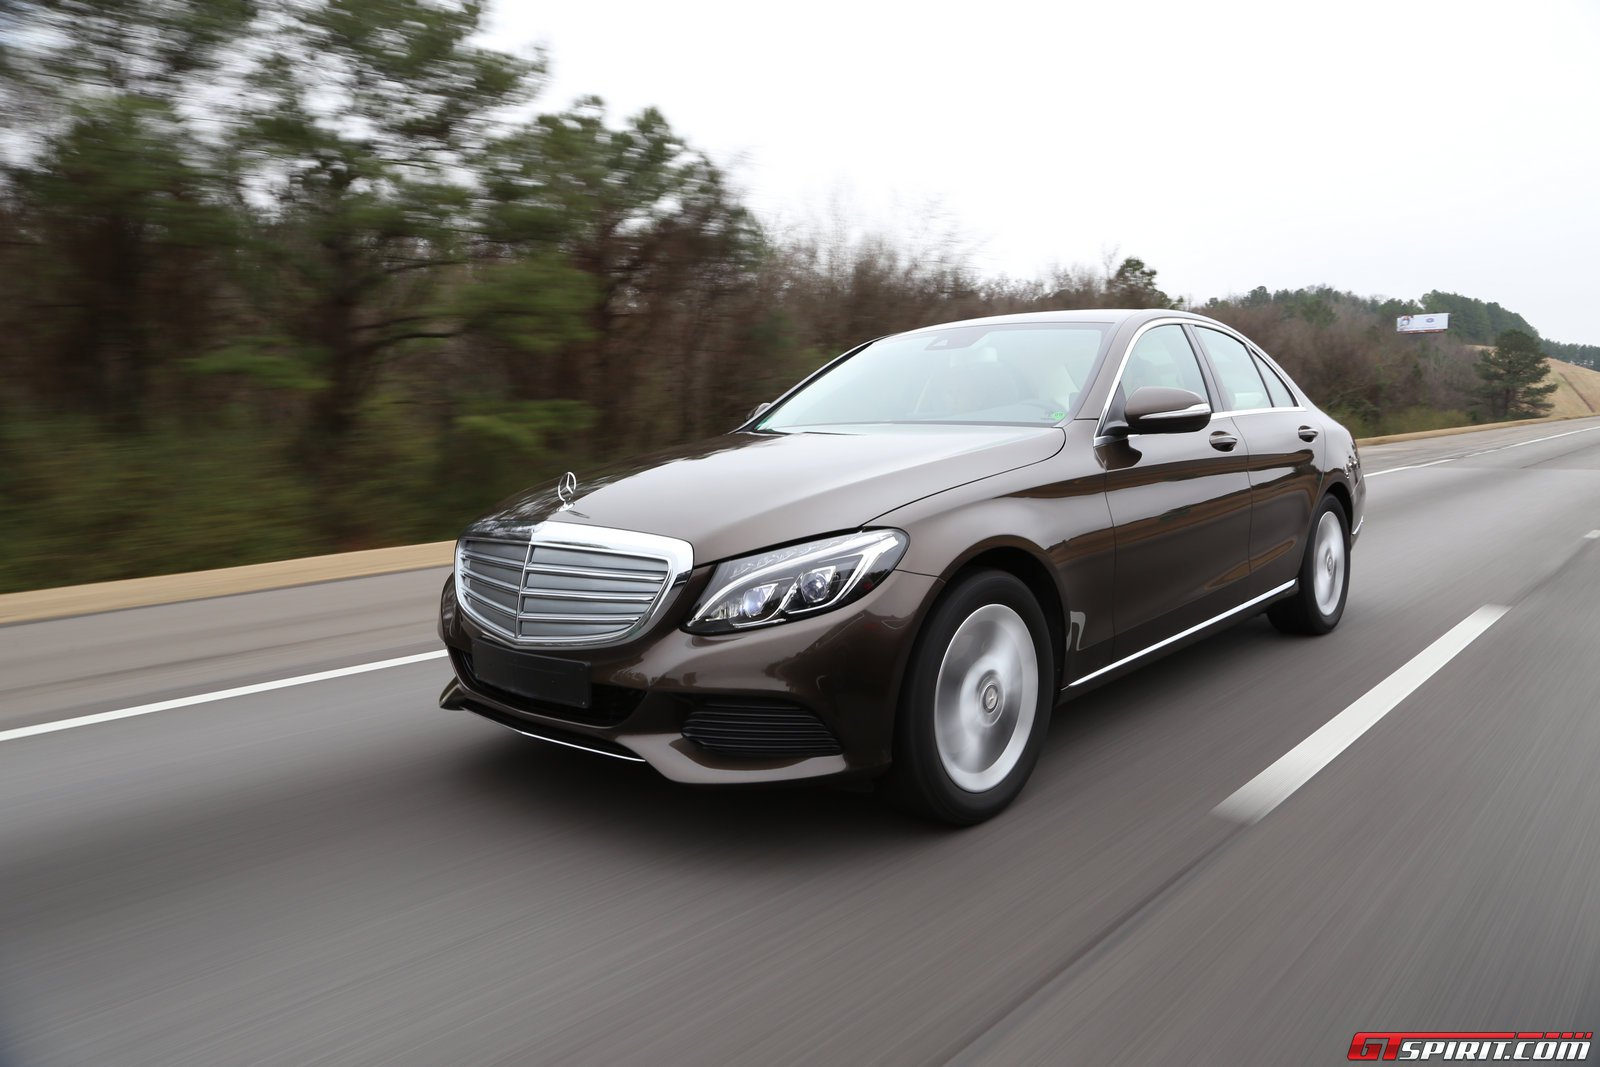 Mercedes benz road trip 2014 day 2 meridian to nashville for Shop mercedes benz